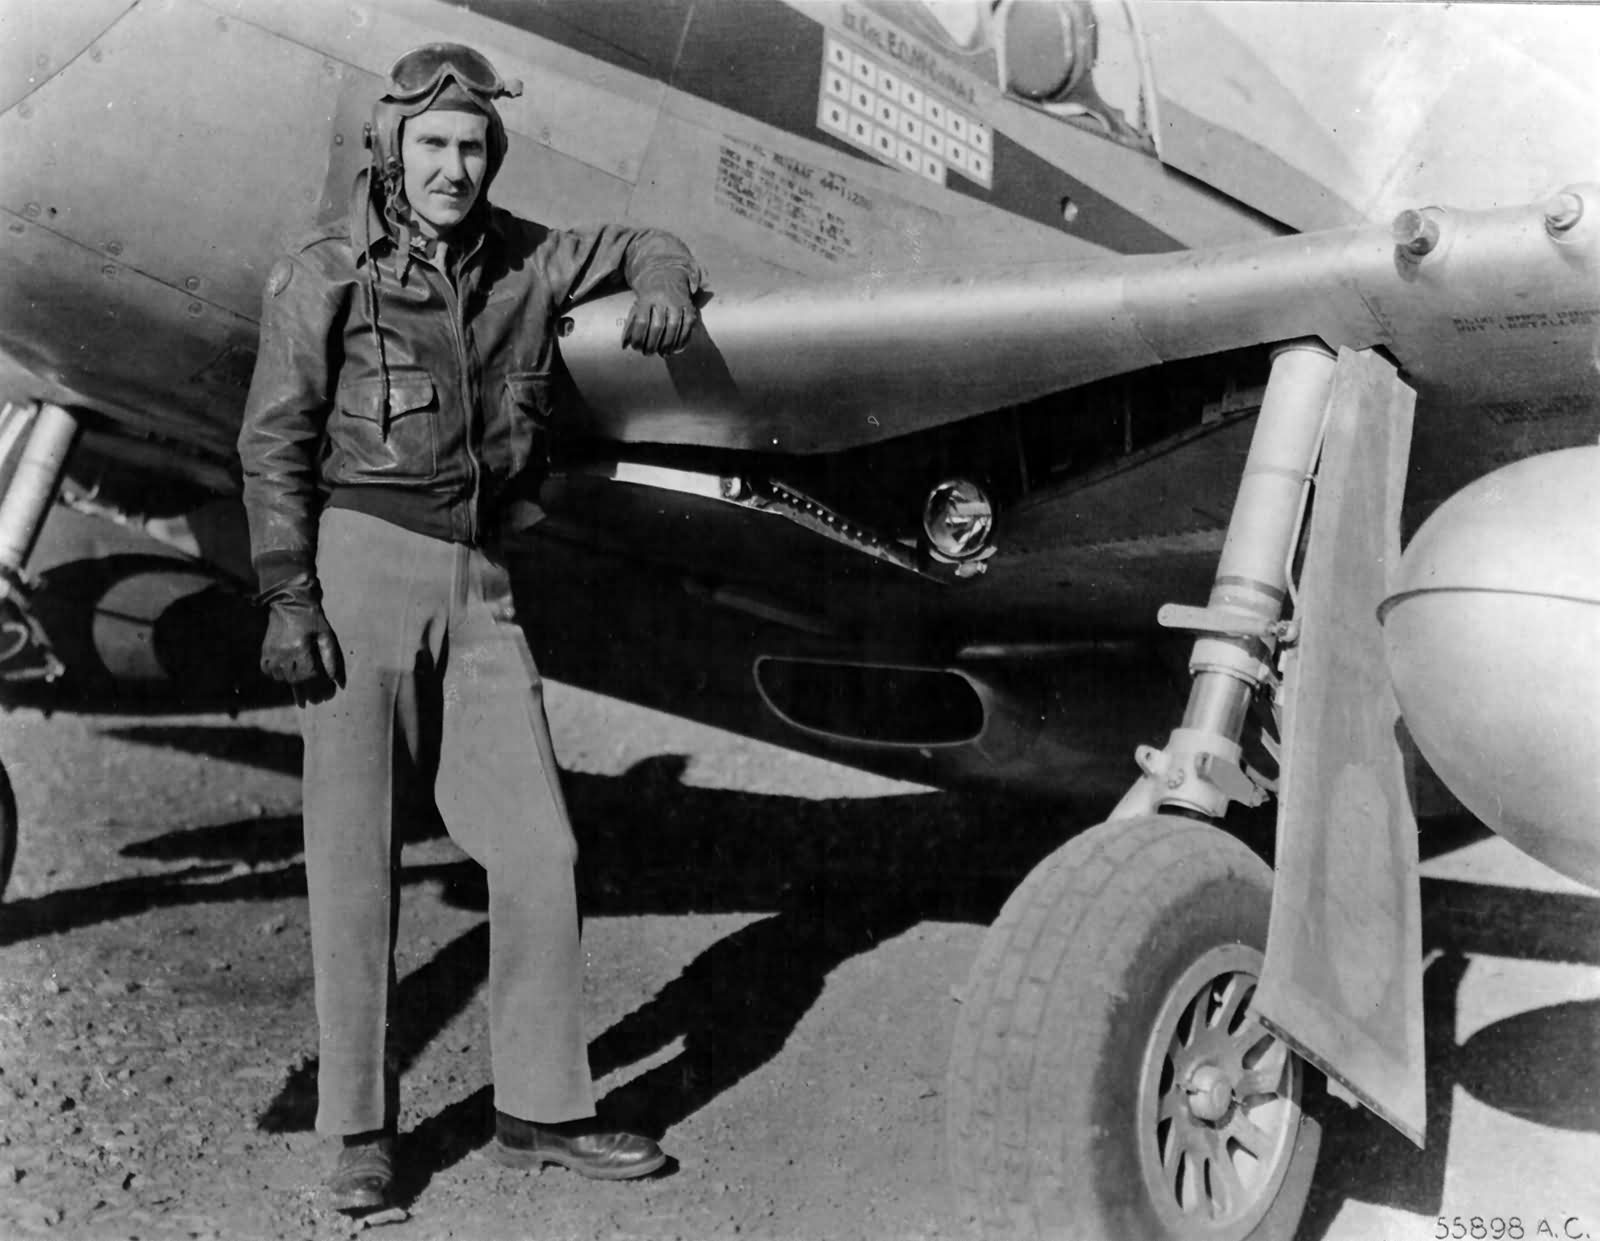 P-51D_44-11280_Pilot_Lt_Col_Edward_Mccom